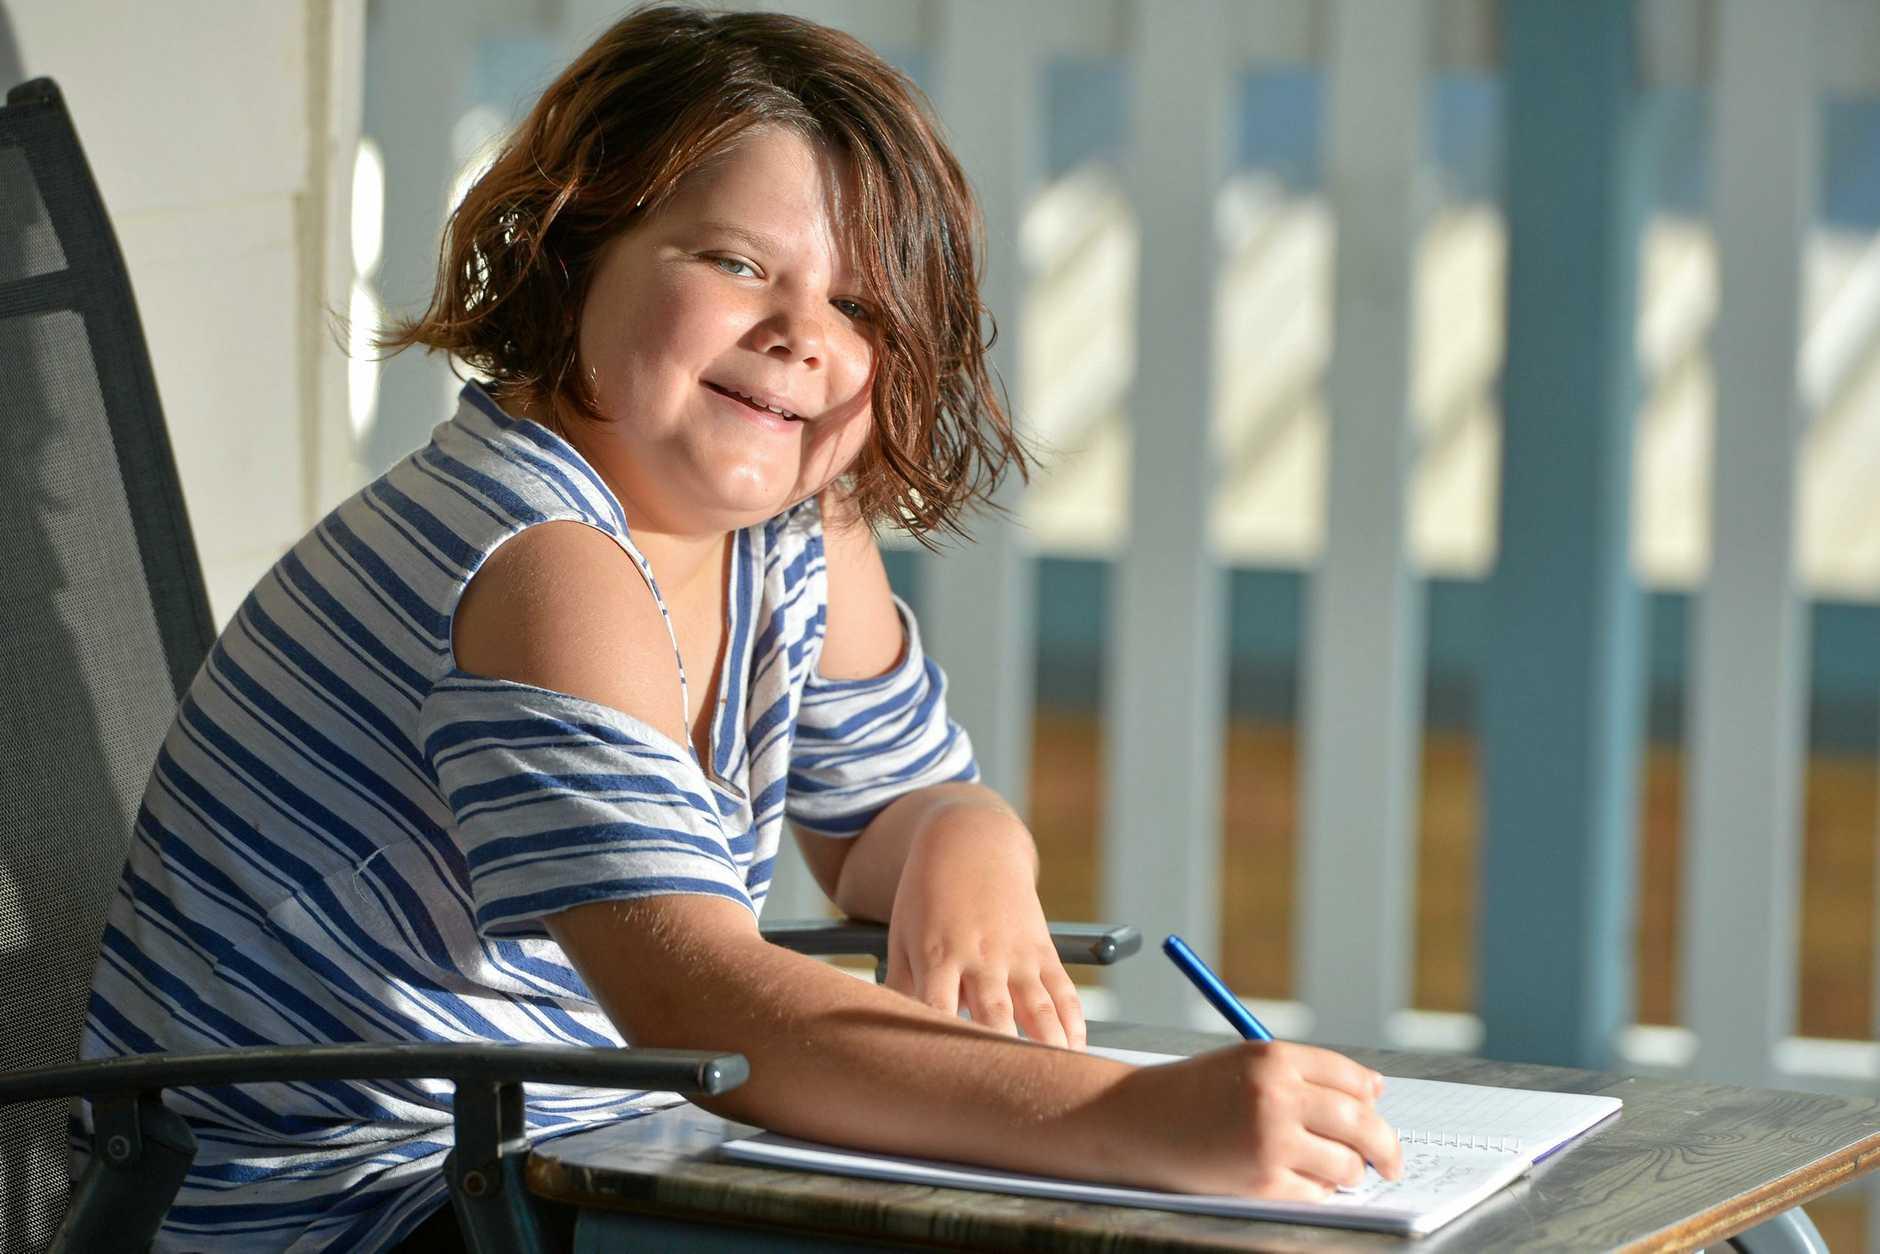 Chloe Sheppard wrote to her mum Kelly about school yard bullies.